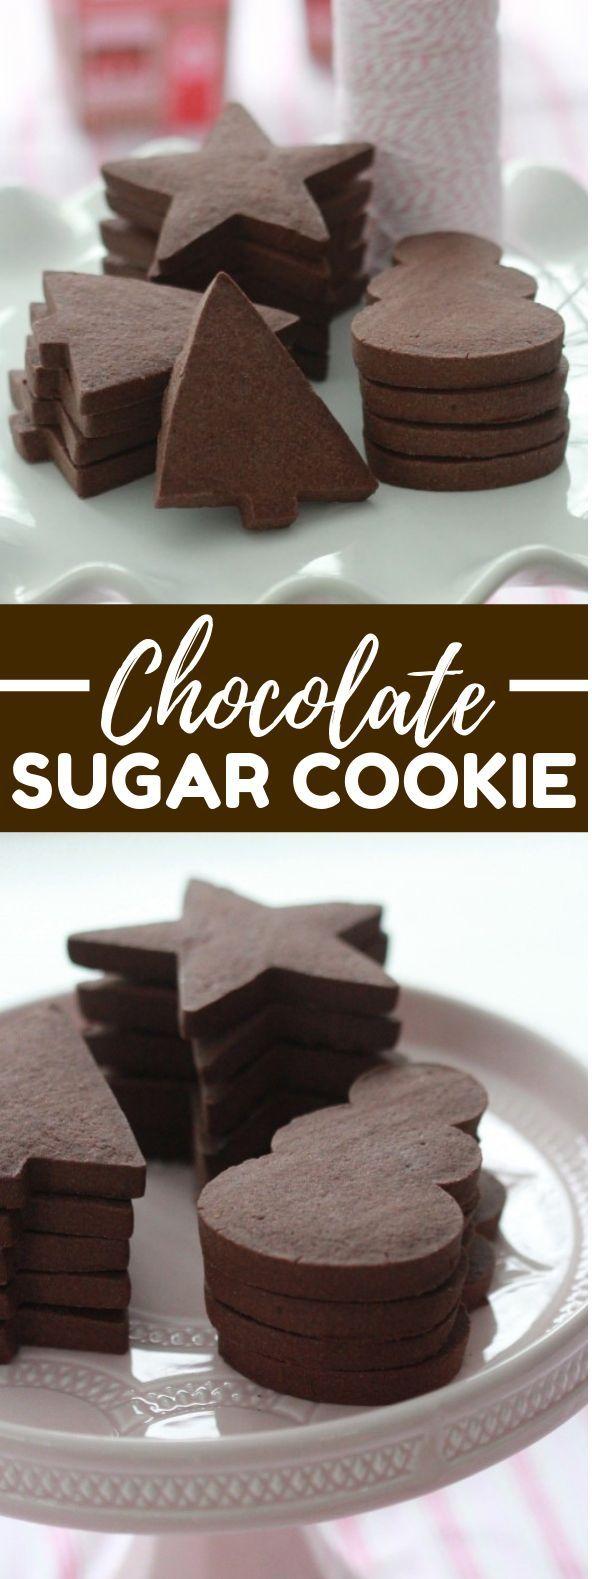 Chocolate Sugar Cookie Recipe {Cut Out Cookies} -